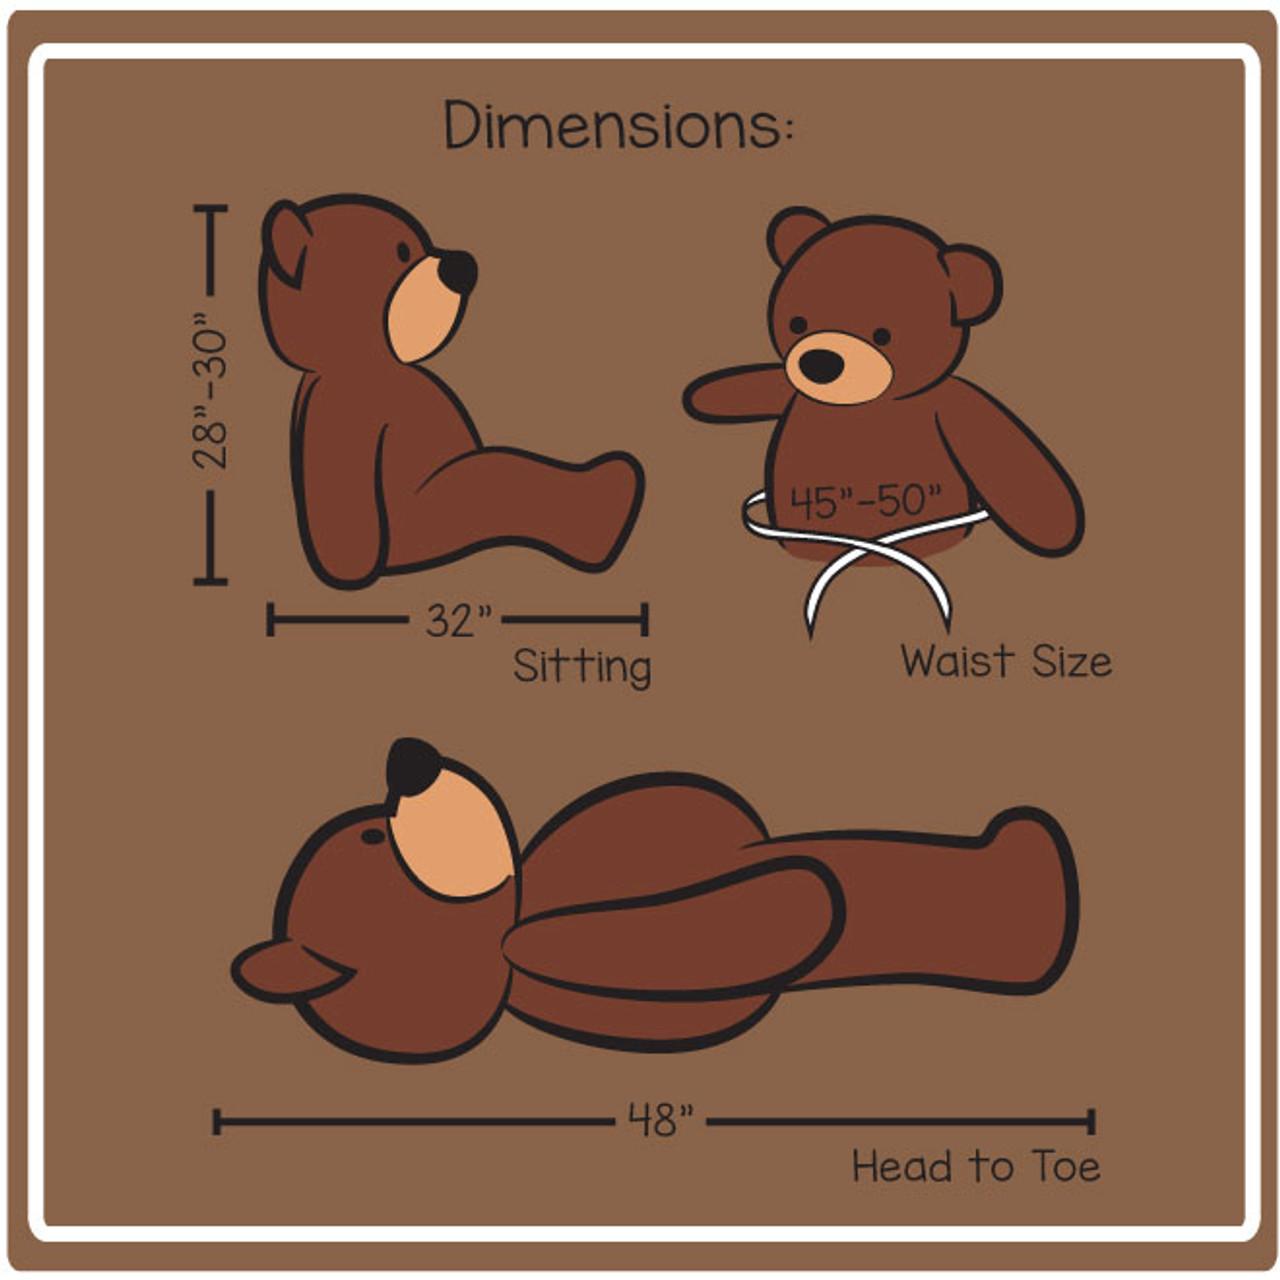 Cuddles Dimensions 4 foot